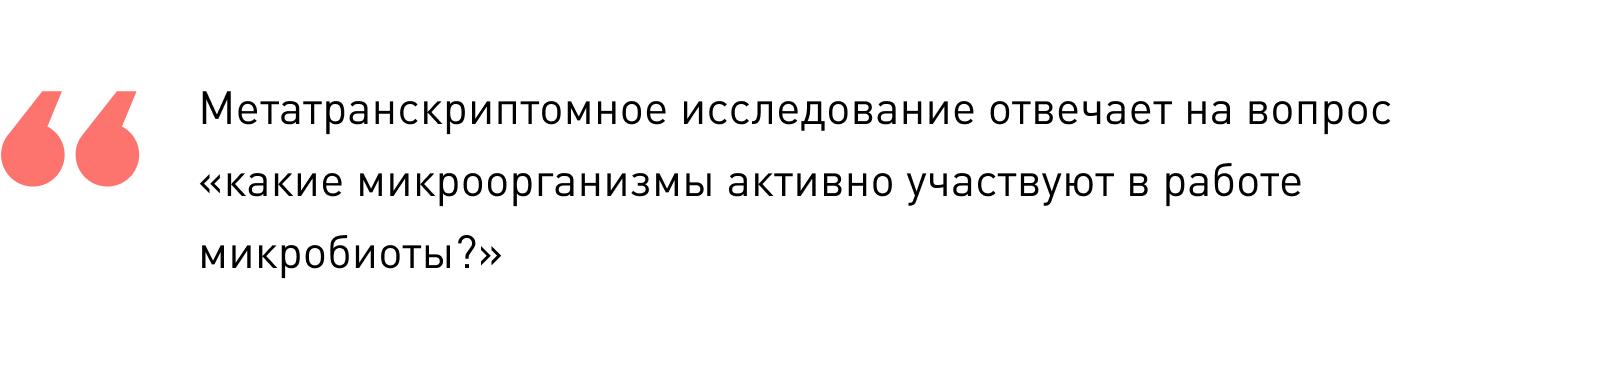 fcjgej5f2vfulmc_pjiwqhfu8eu.png